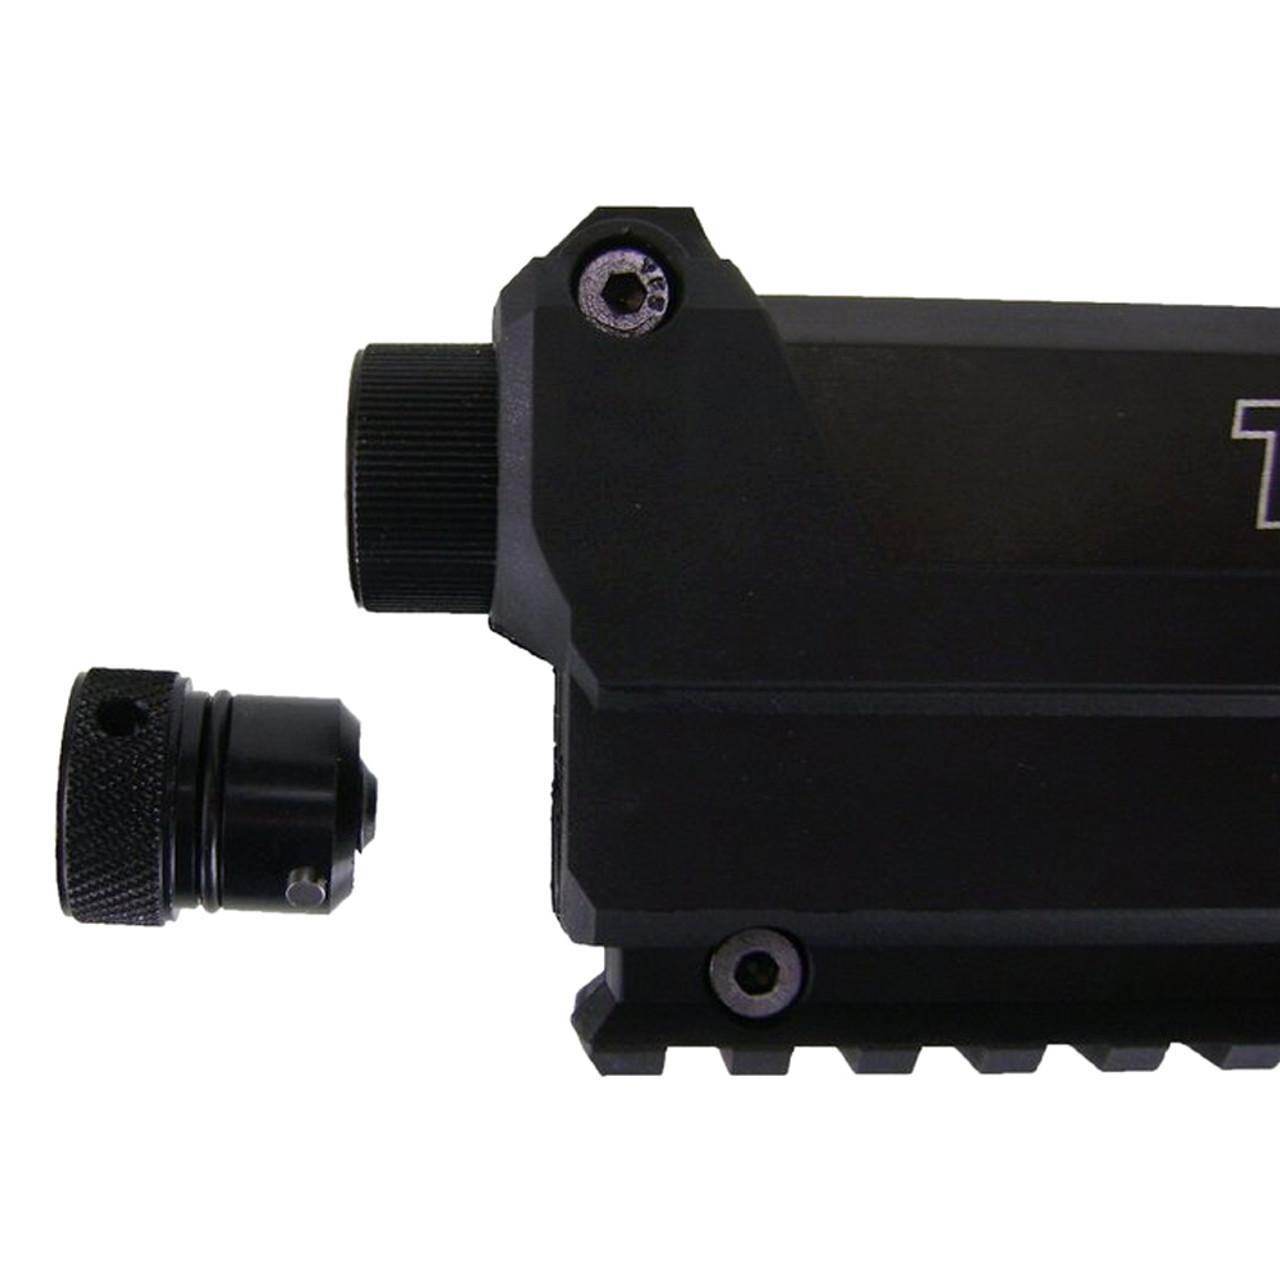 TIPPMANN TiPX 68 Caliber Paintball Pistol Marker (T120001)